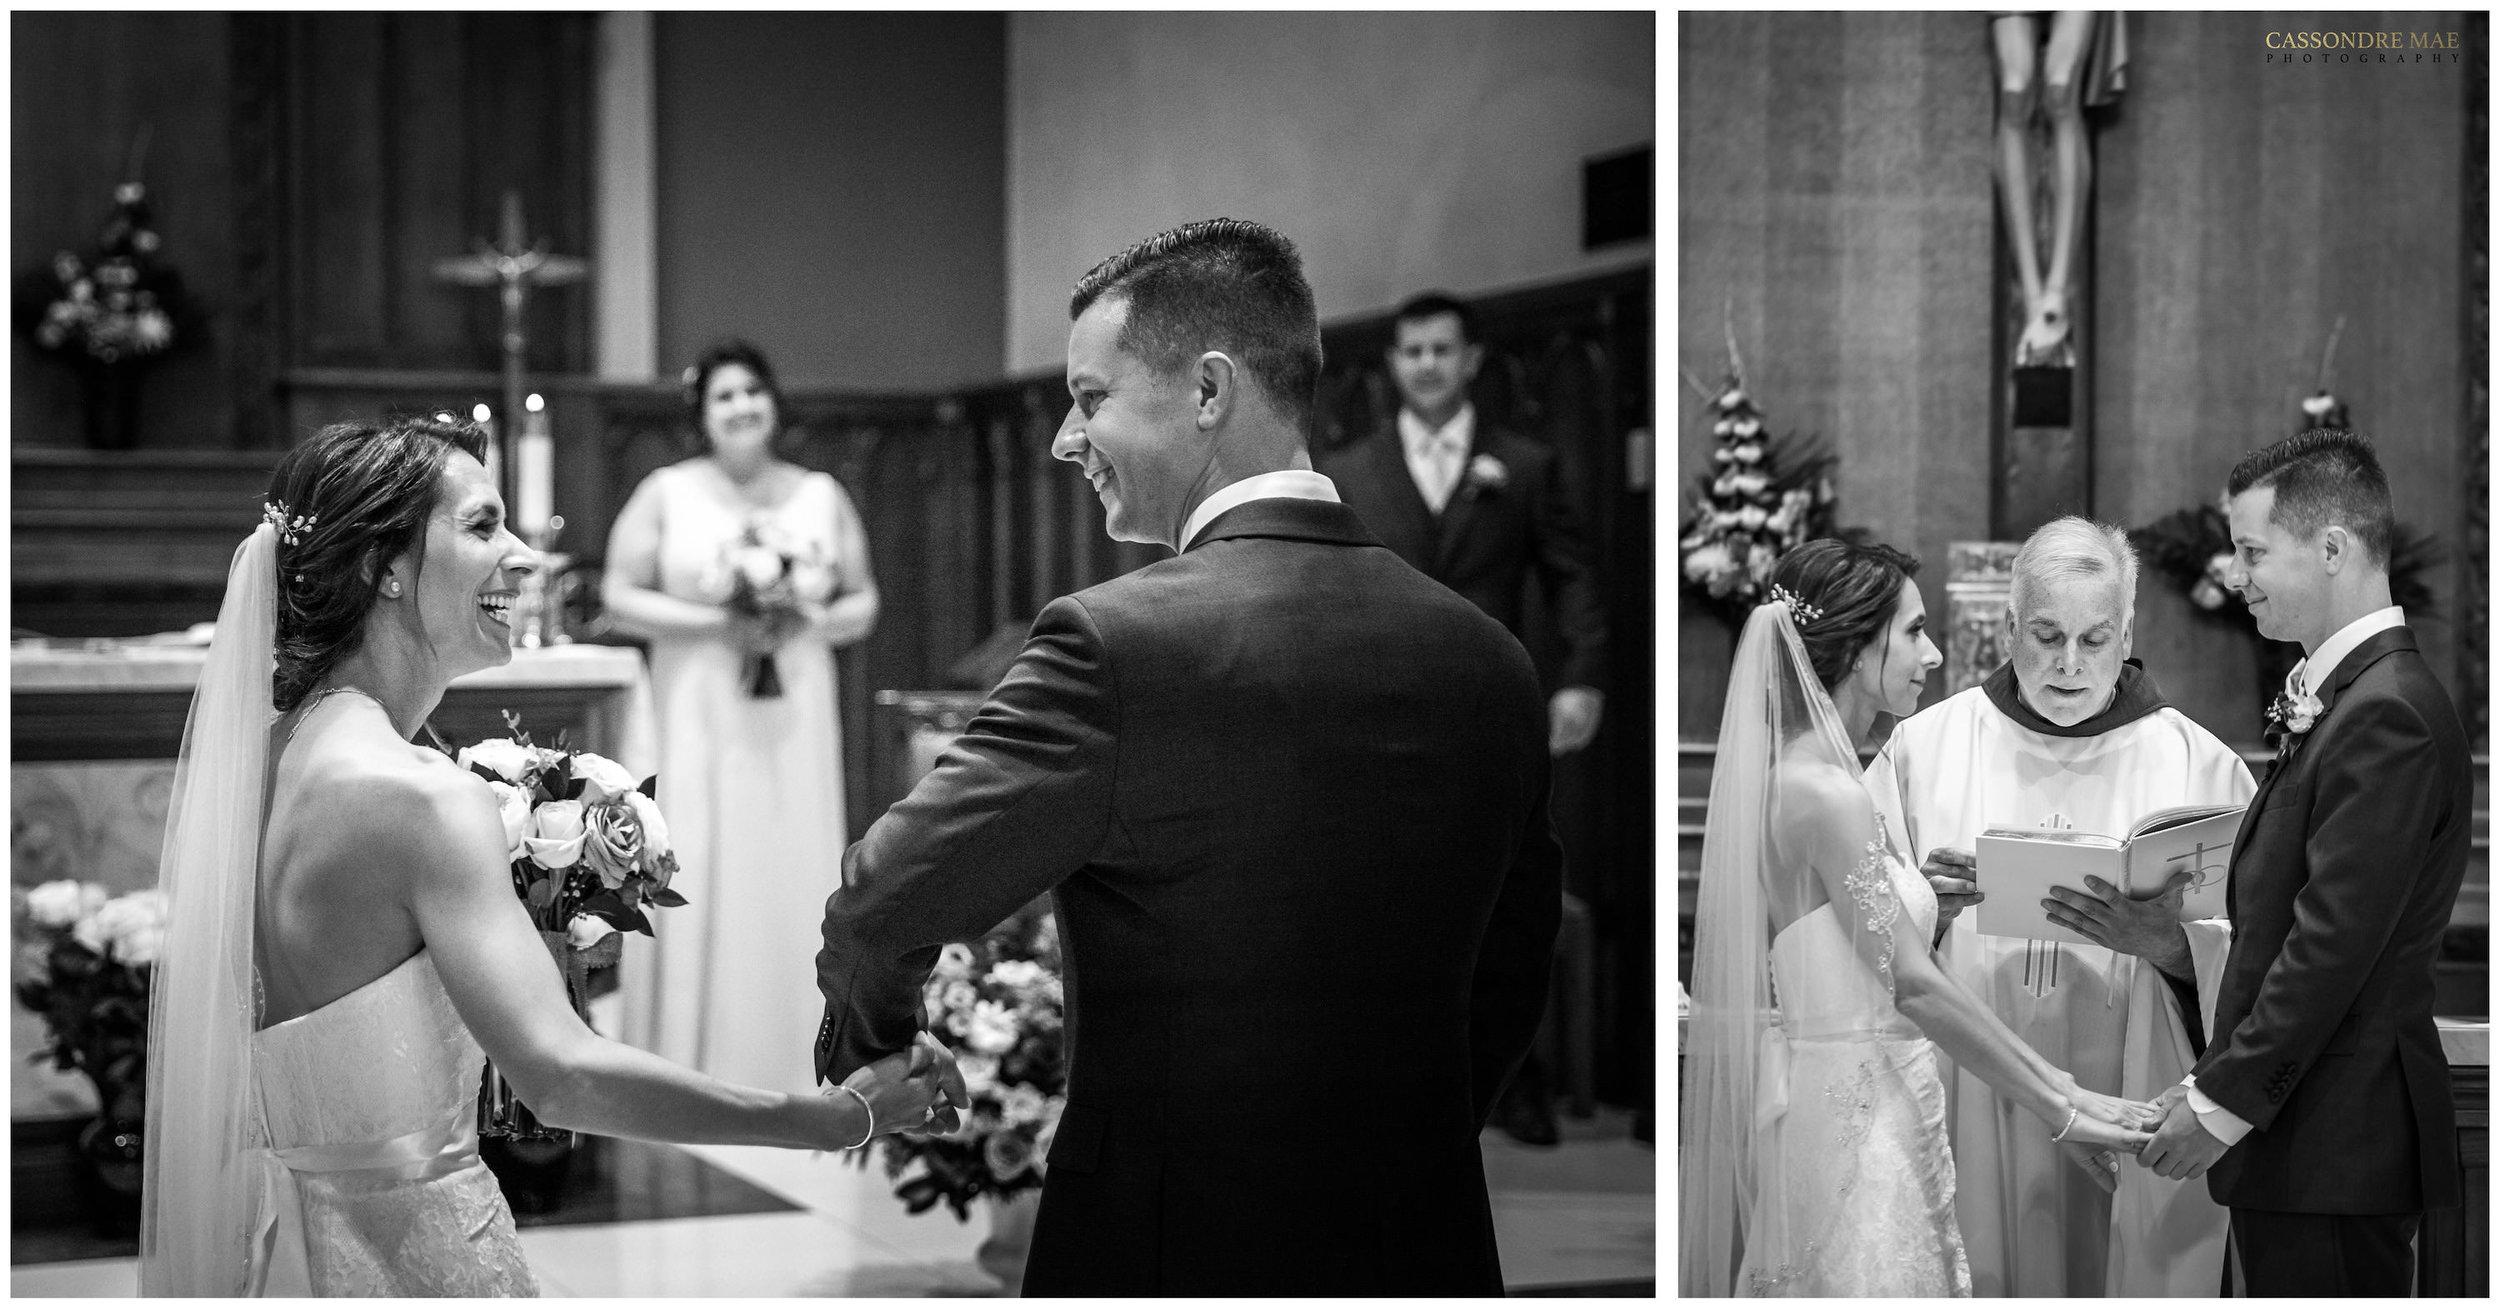 Cassondre Mae Photography Links at Unionvale Wedding 10.jpg